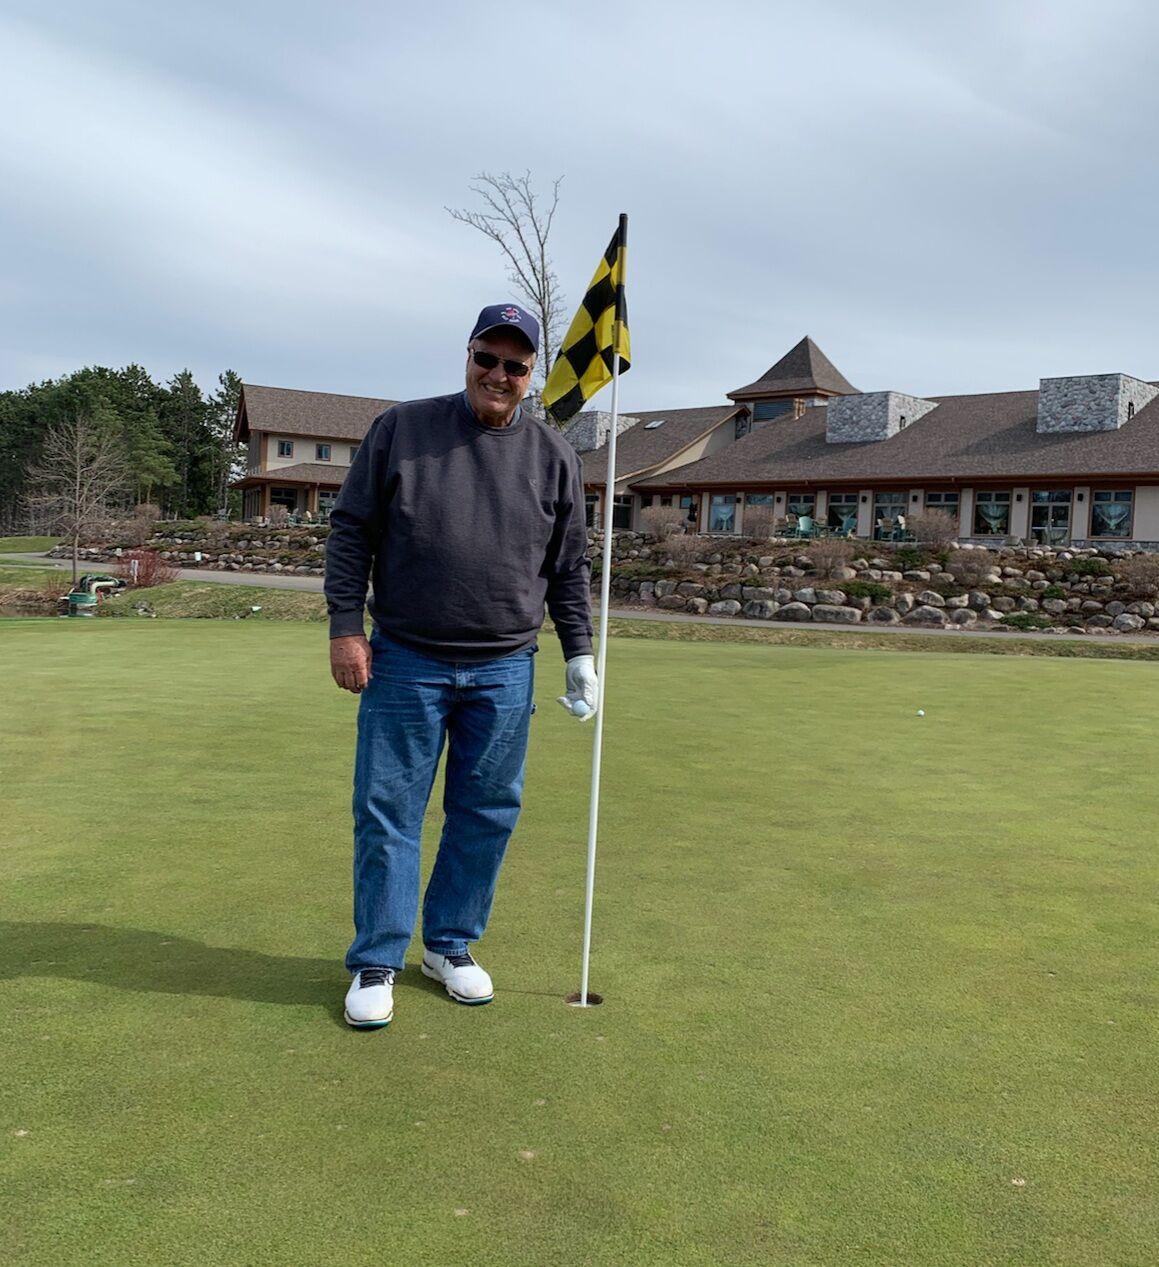 Jim Bryant playing golf